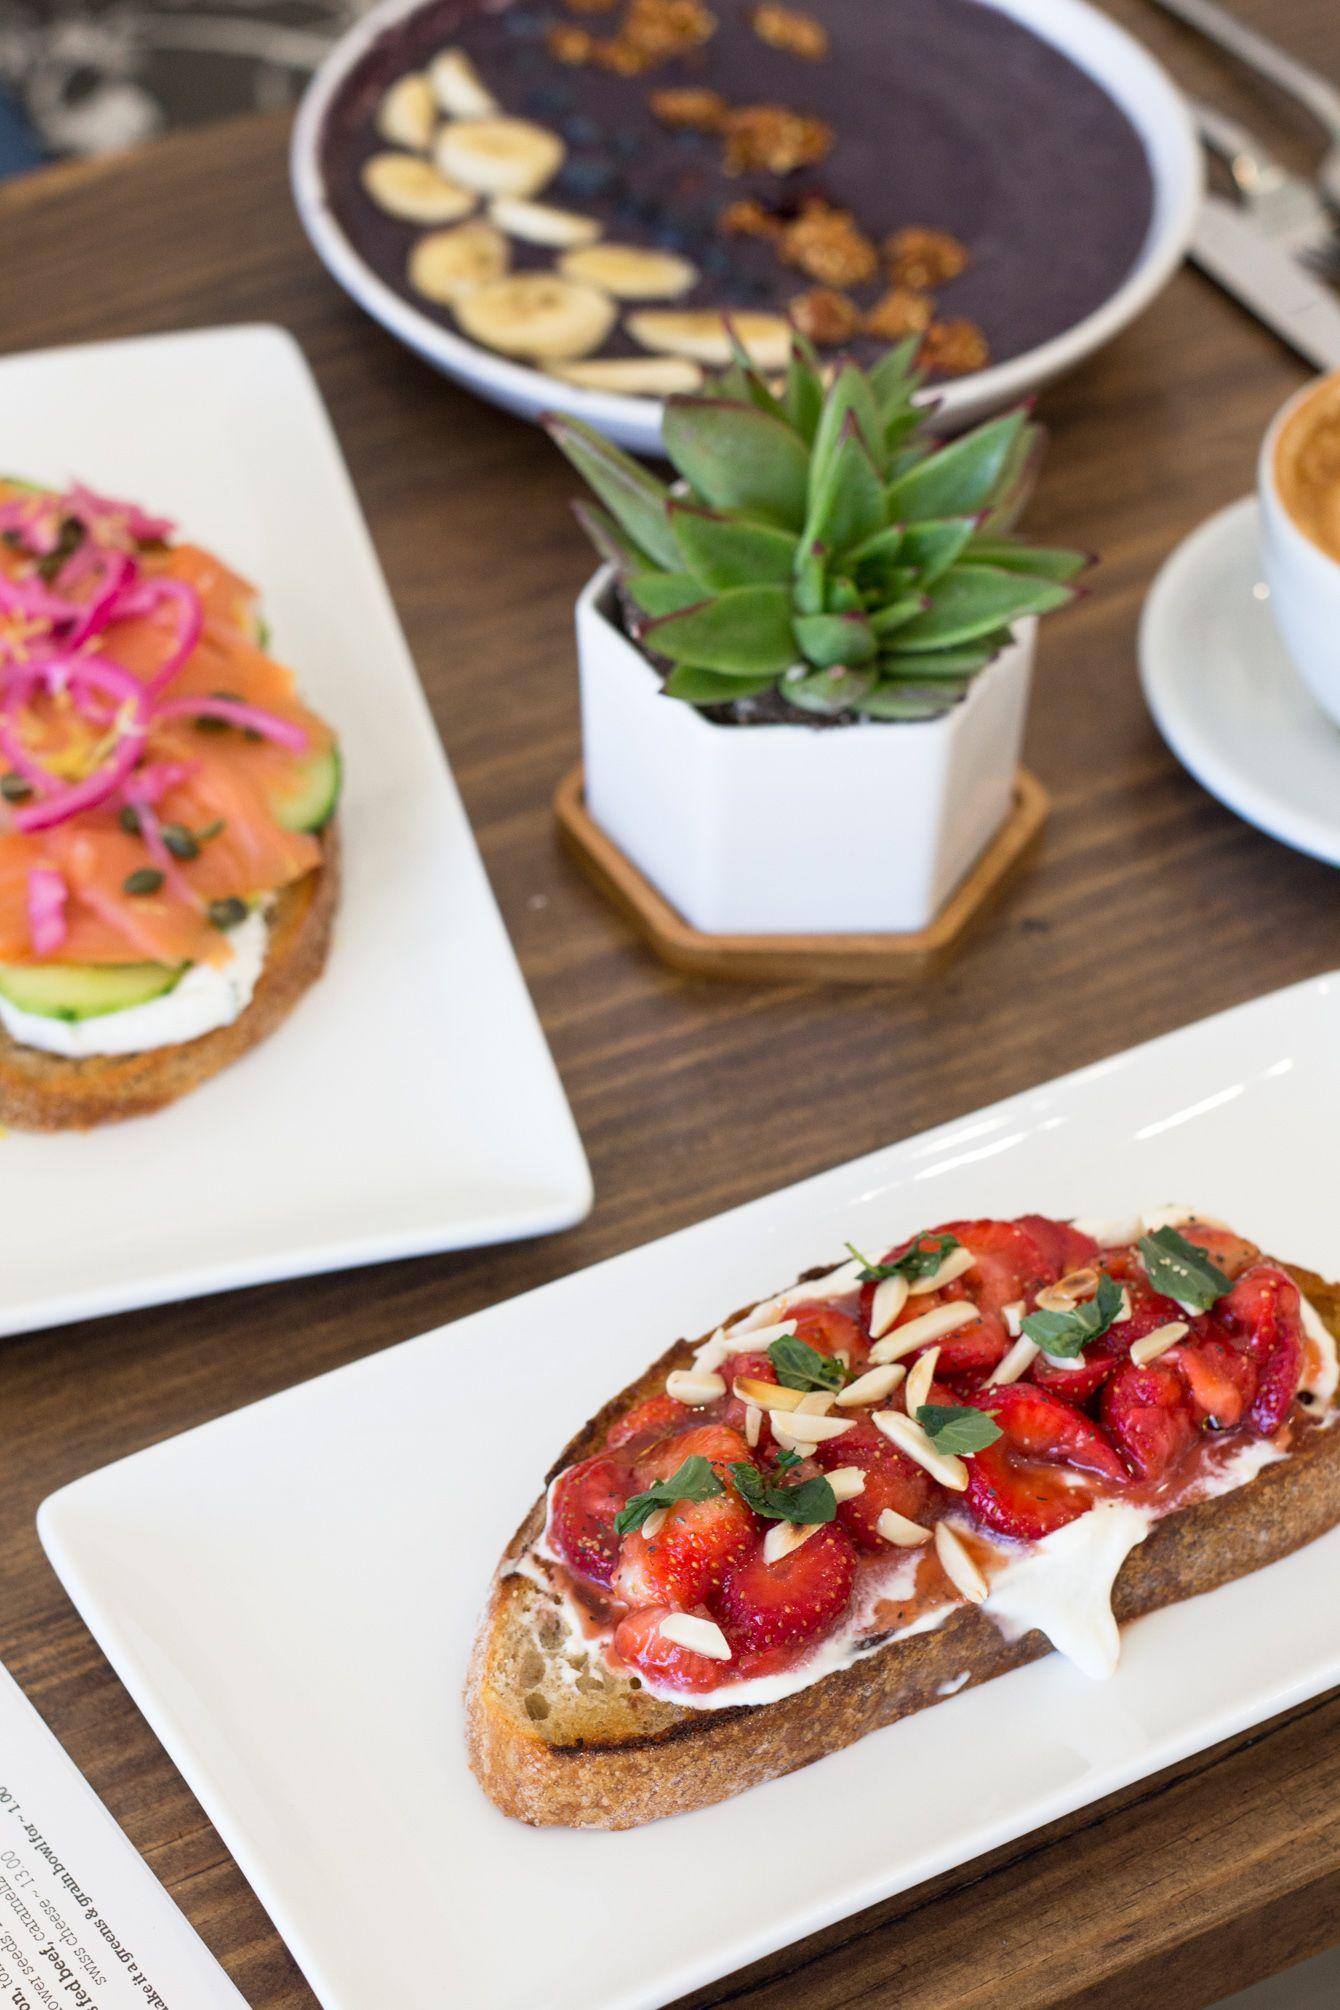 Best Brunch And Breakfast Restaurants In Destin 30a Jamie Kamber